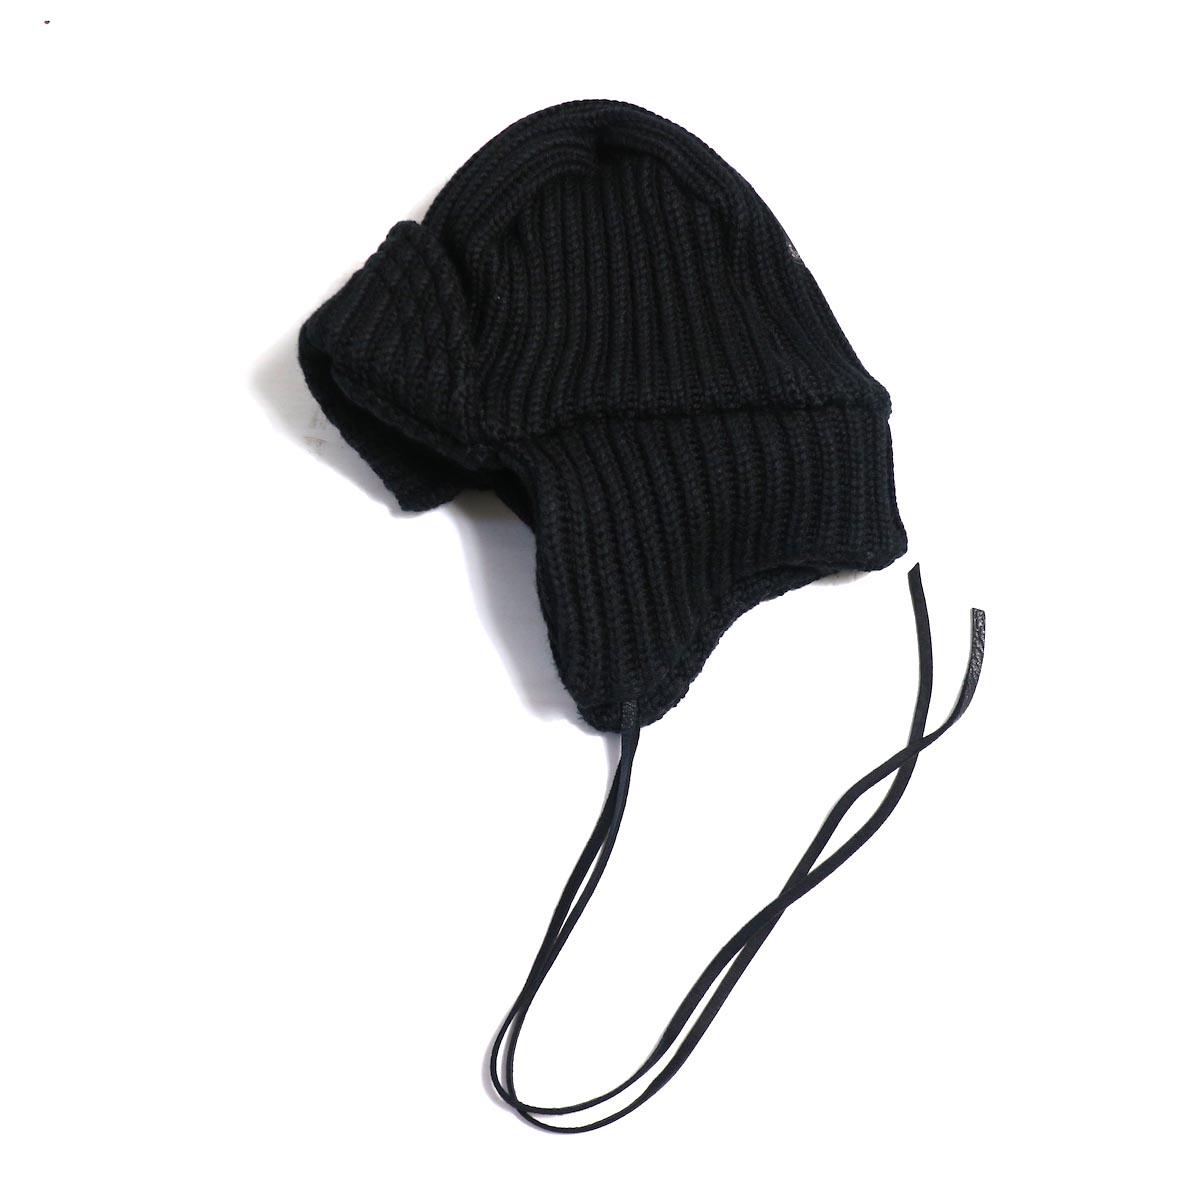 SOUTH2 WEST8 / Bomber Cap w/a Knit -BLACK